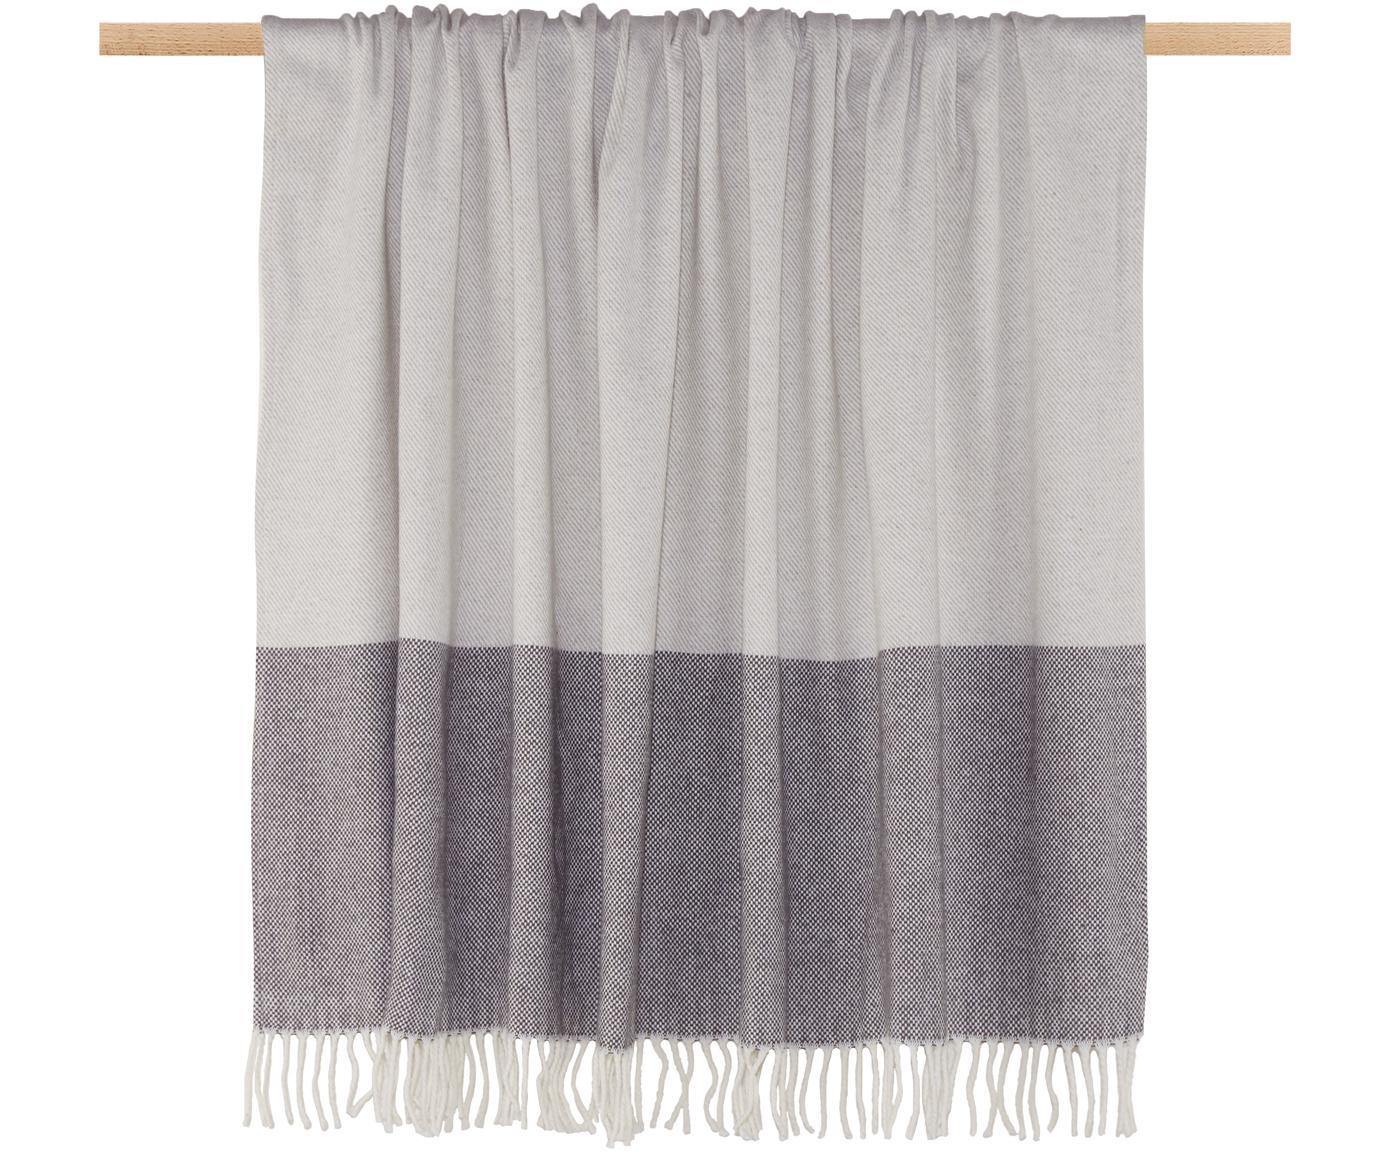 Manta Stripes, 50%algodón, 50%poliacrílico, Gris, An 150 x L 200 cm